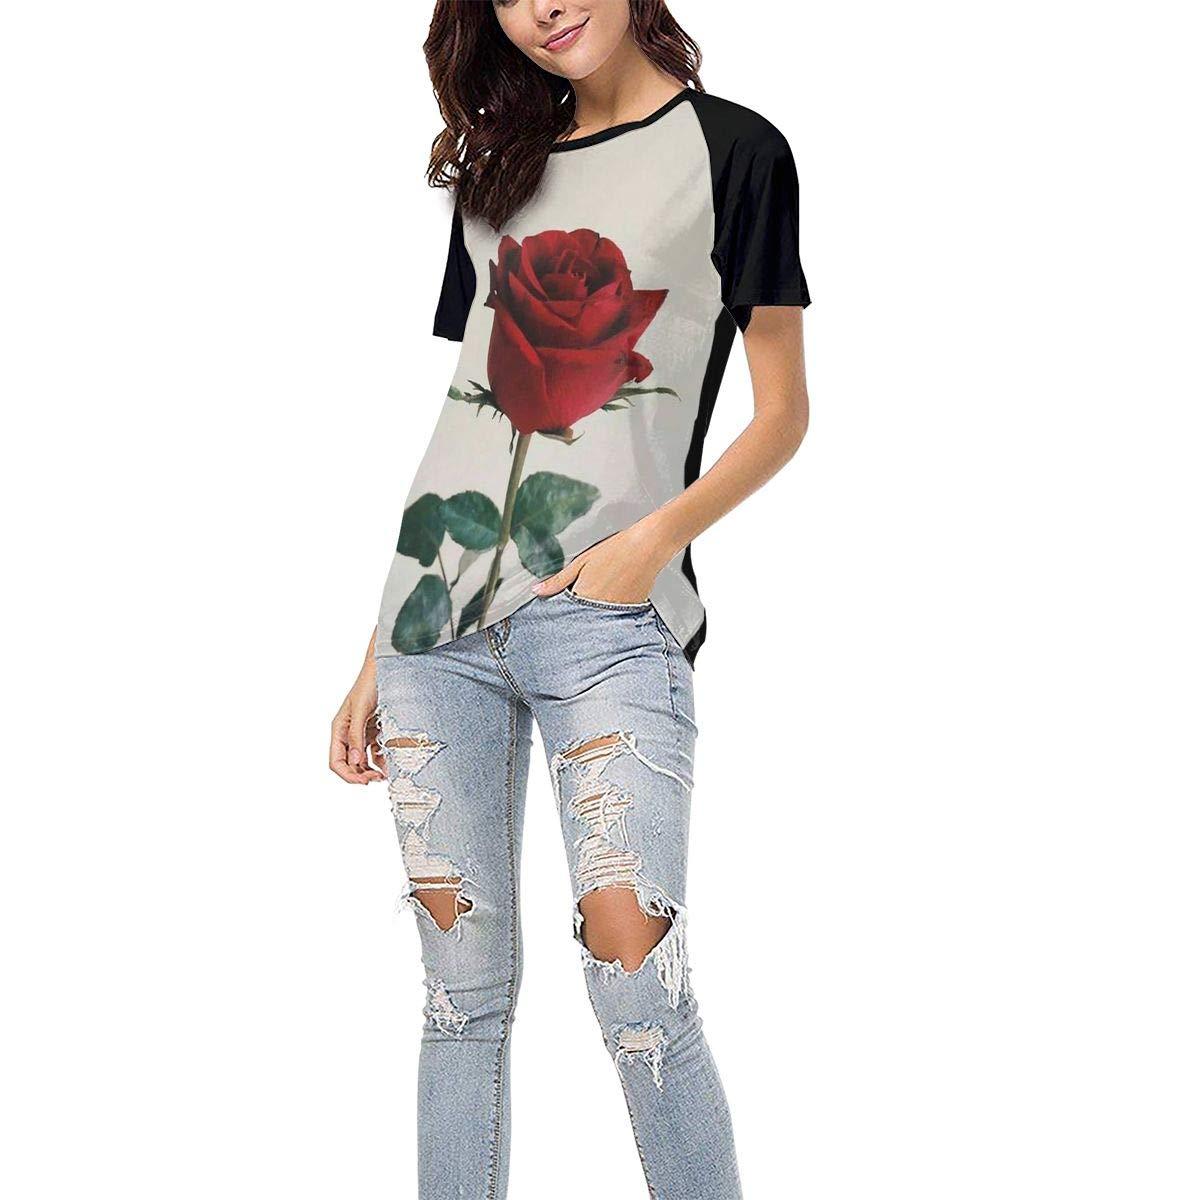 QWXZC Rose Womens Short Sleeves Baseball Tee Casual Raglan Shirt Baseball Raglan T-Shirt.Black.